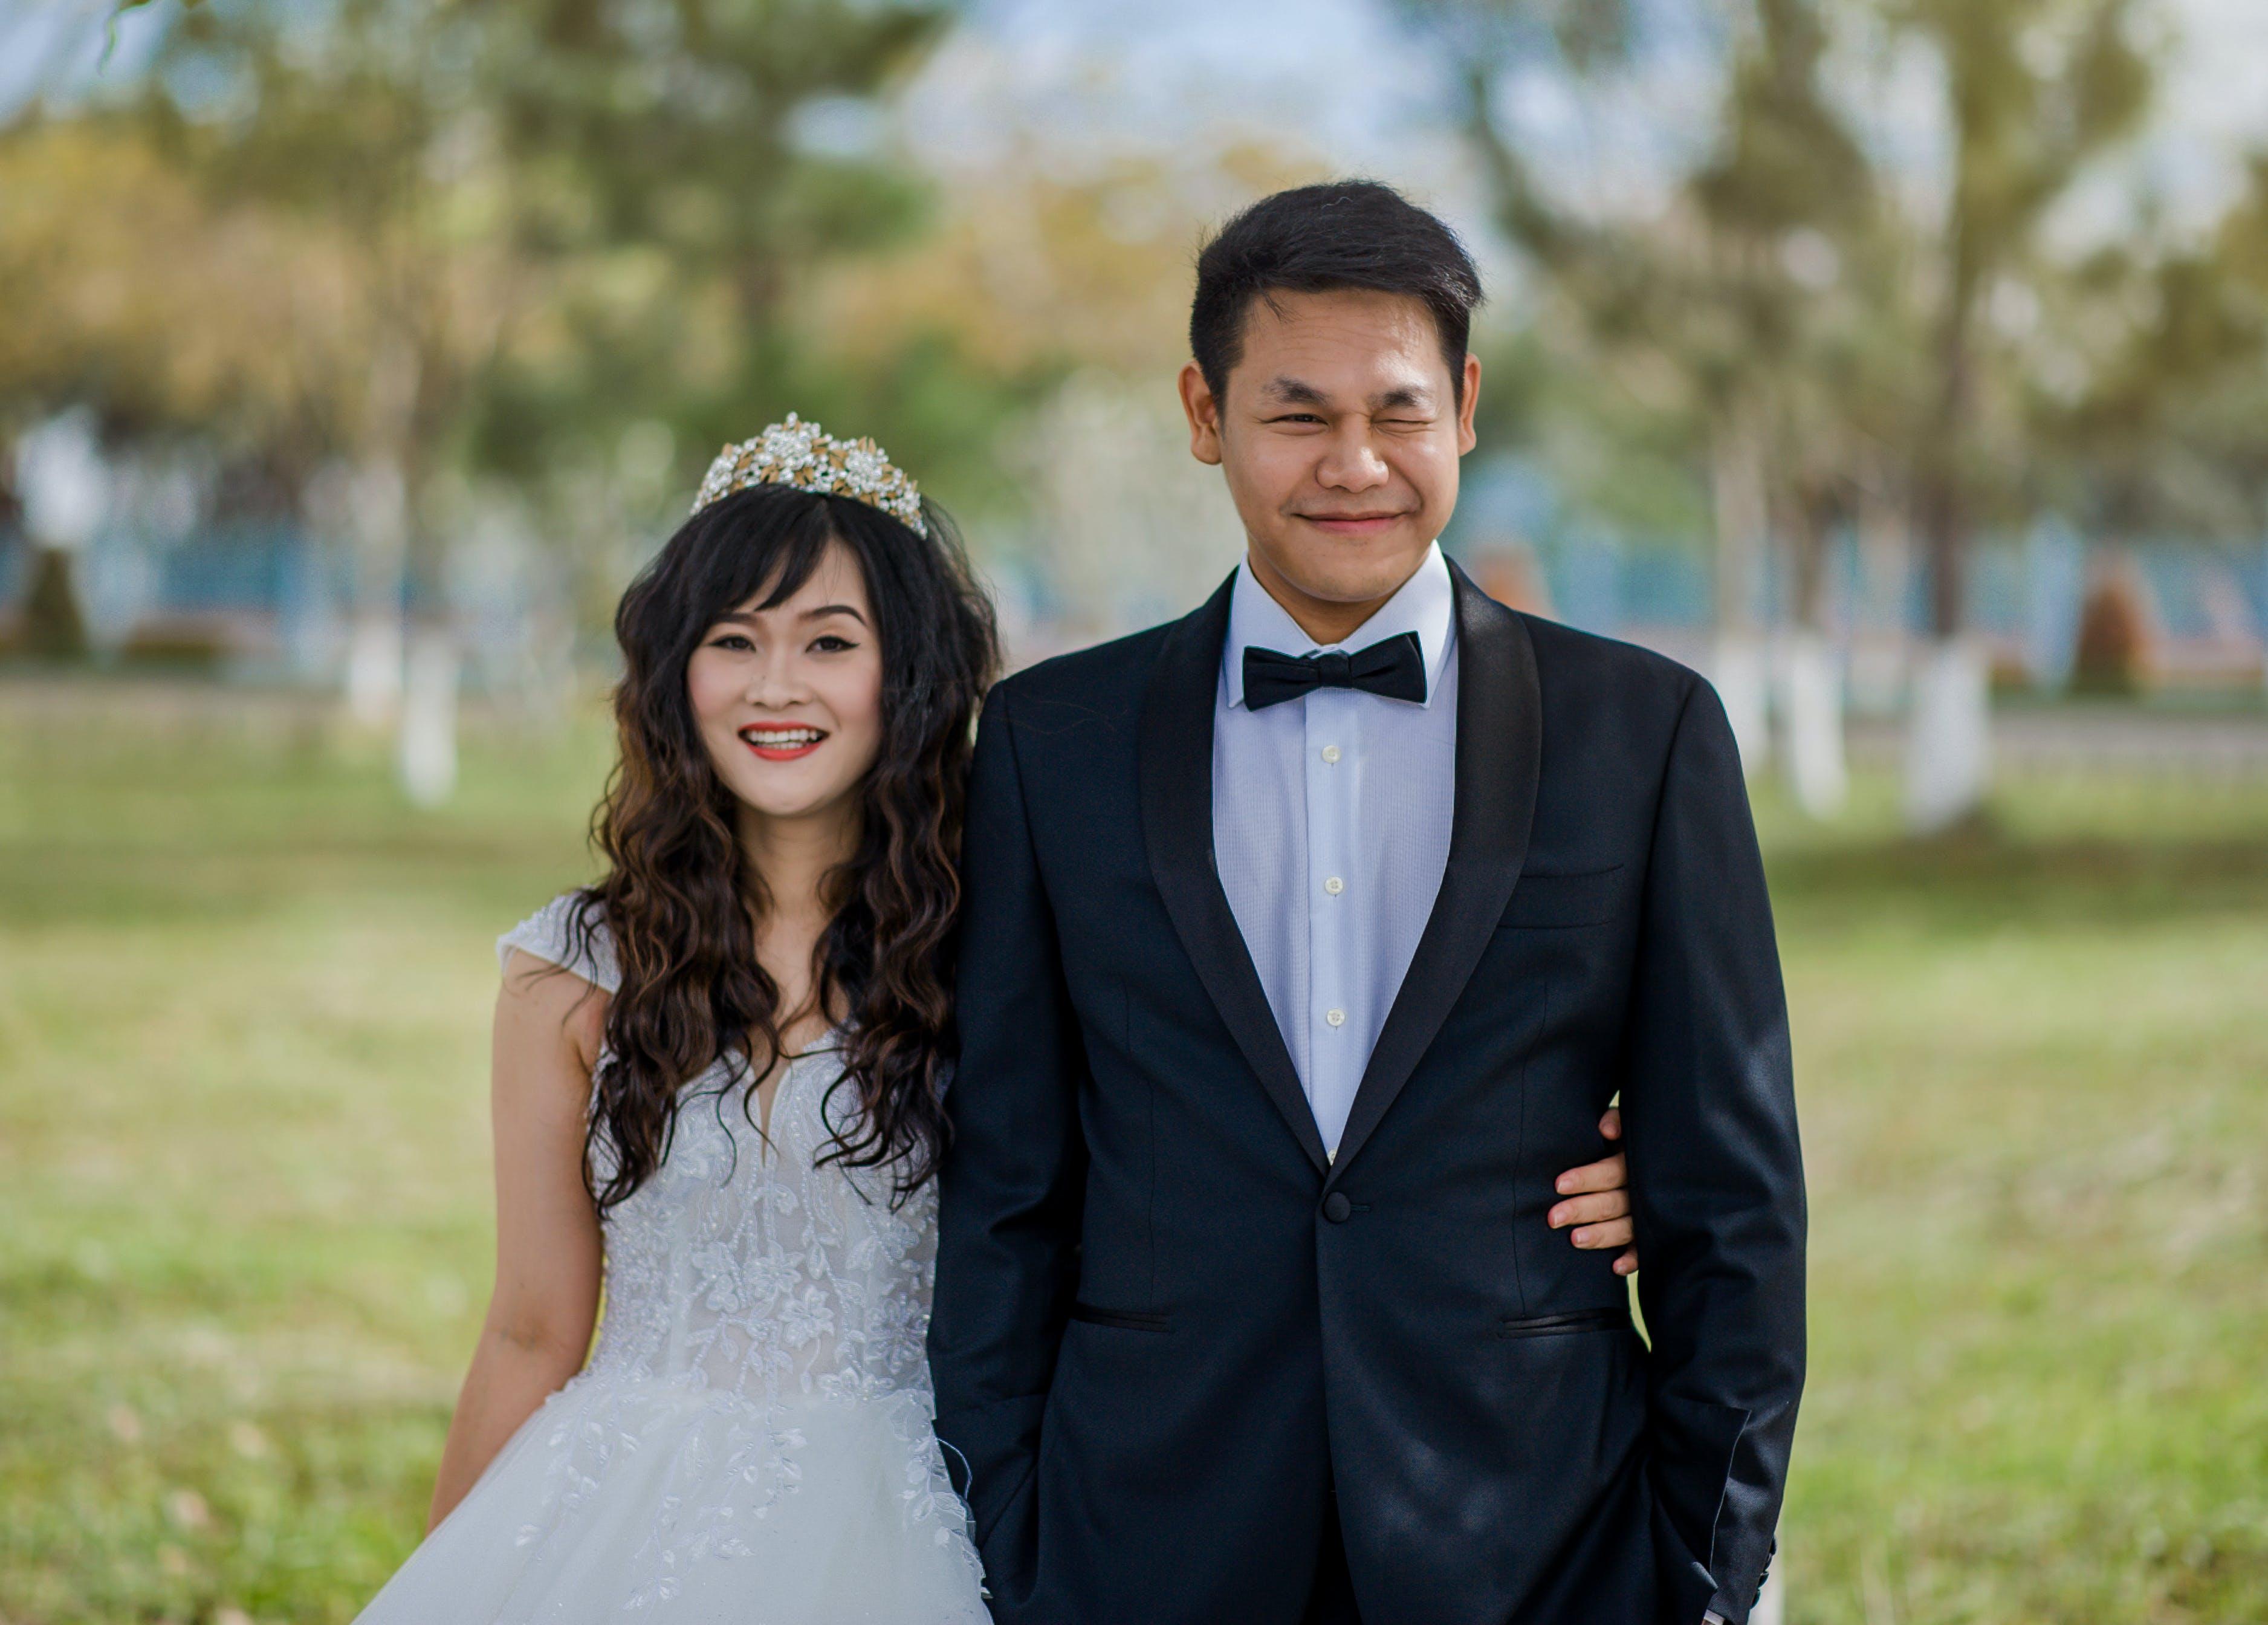 Men Wearing Black Suit Jacket and Woman Wearing White Wedding Gown